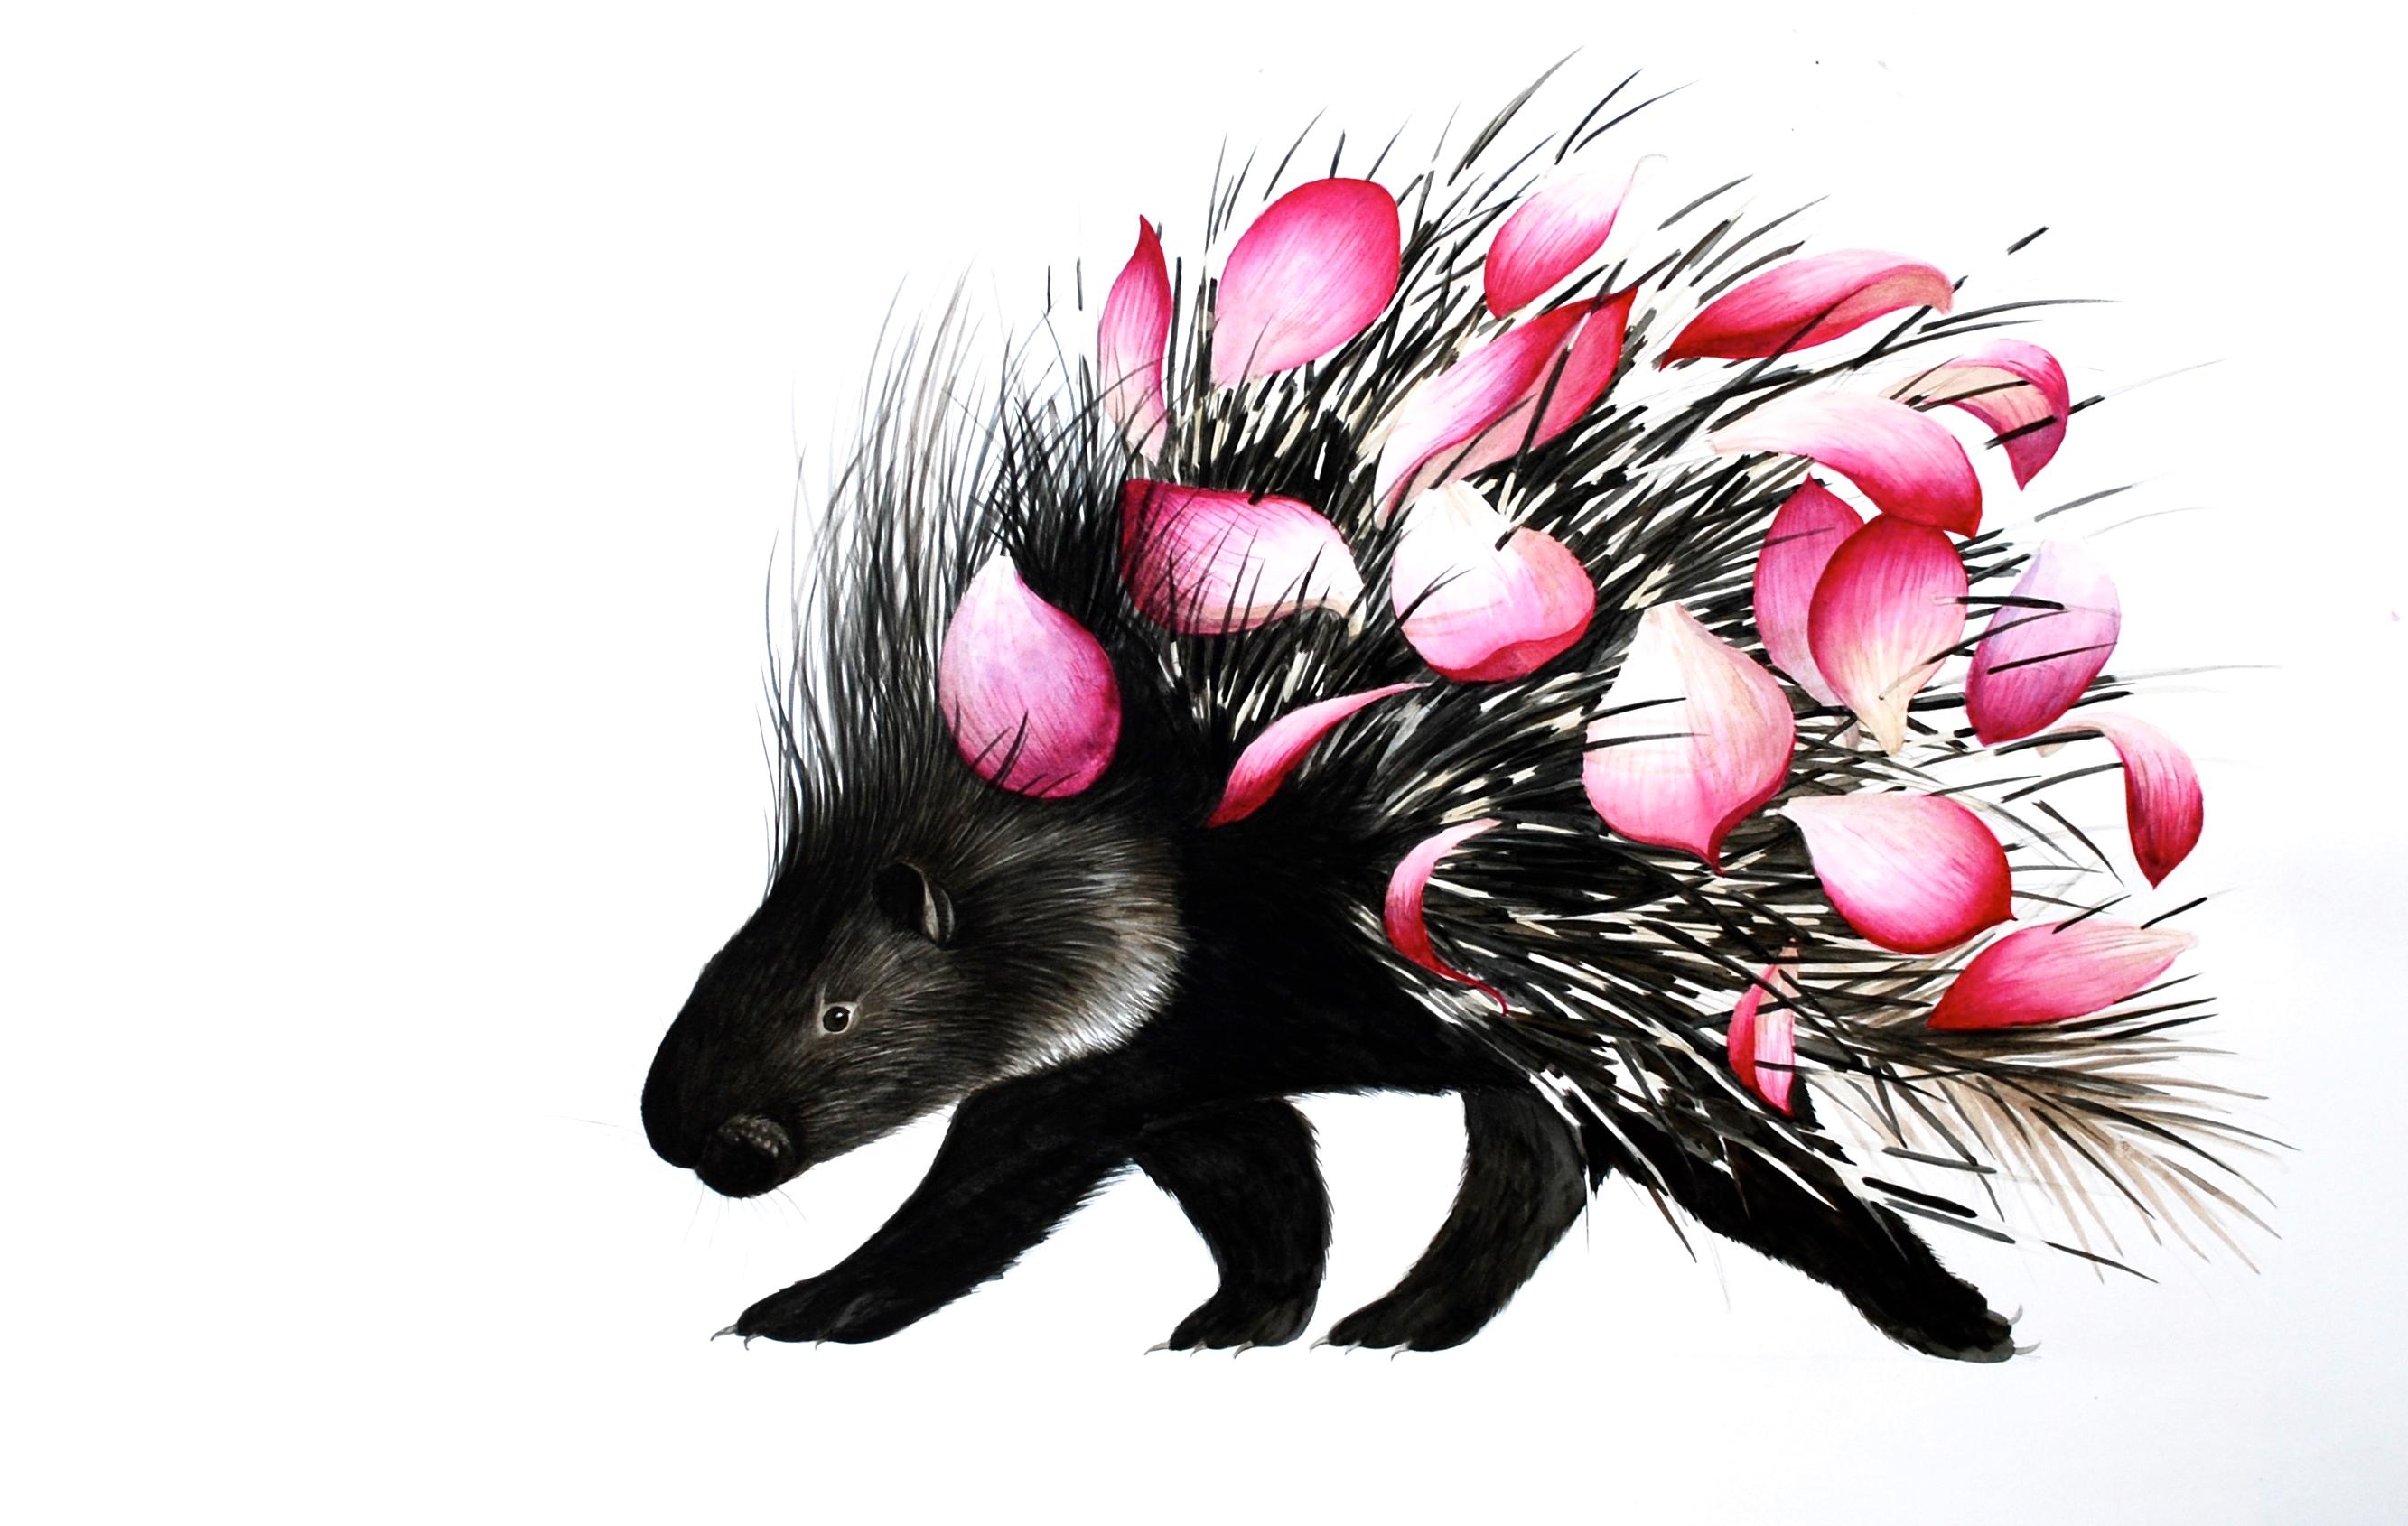 porcupine with lotus petals